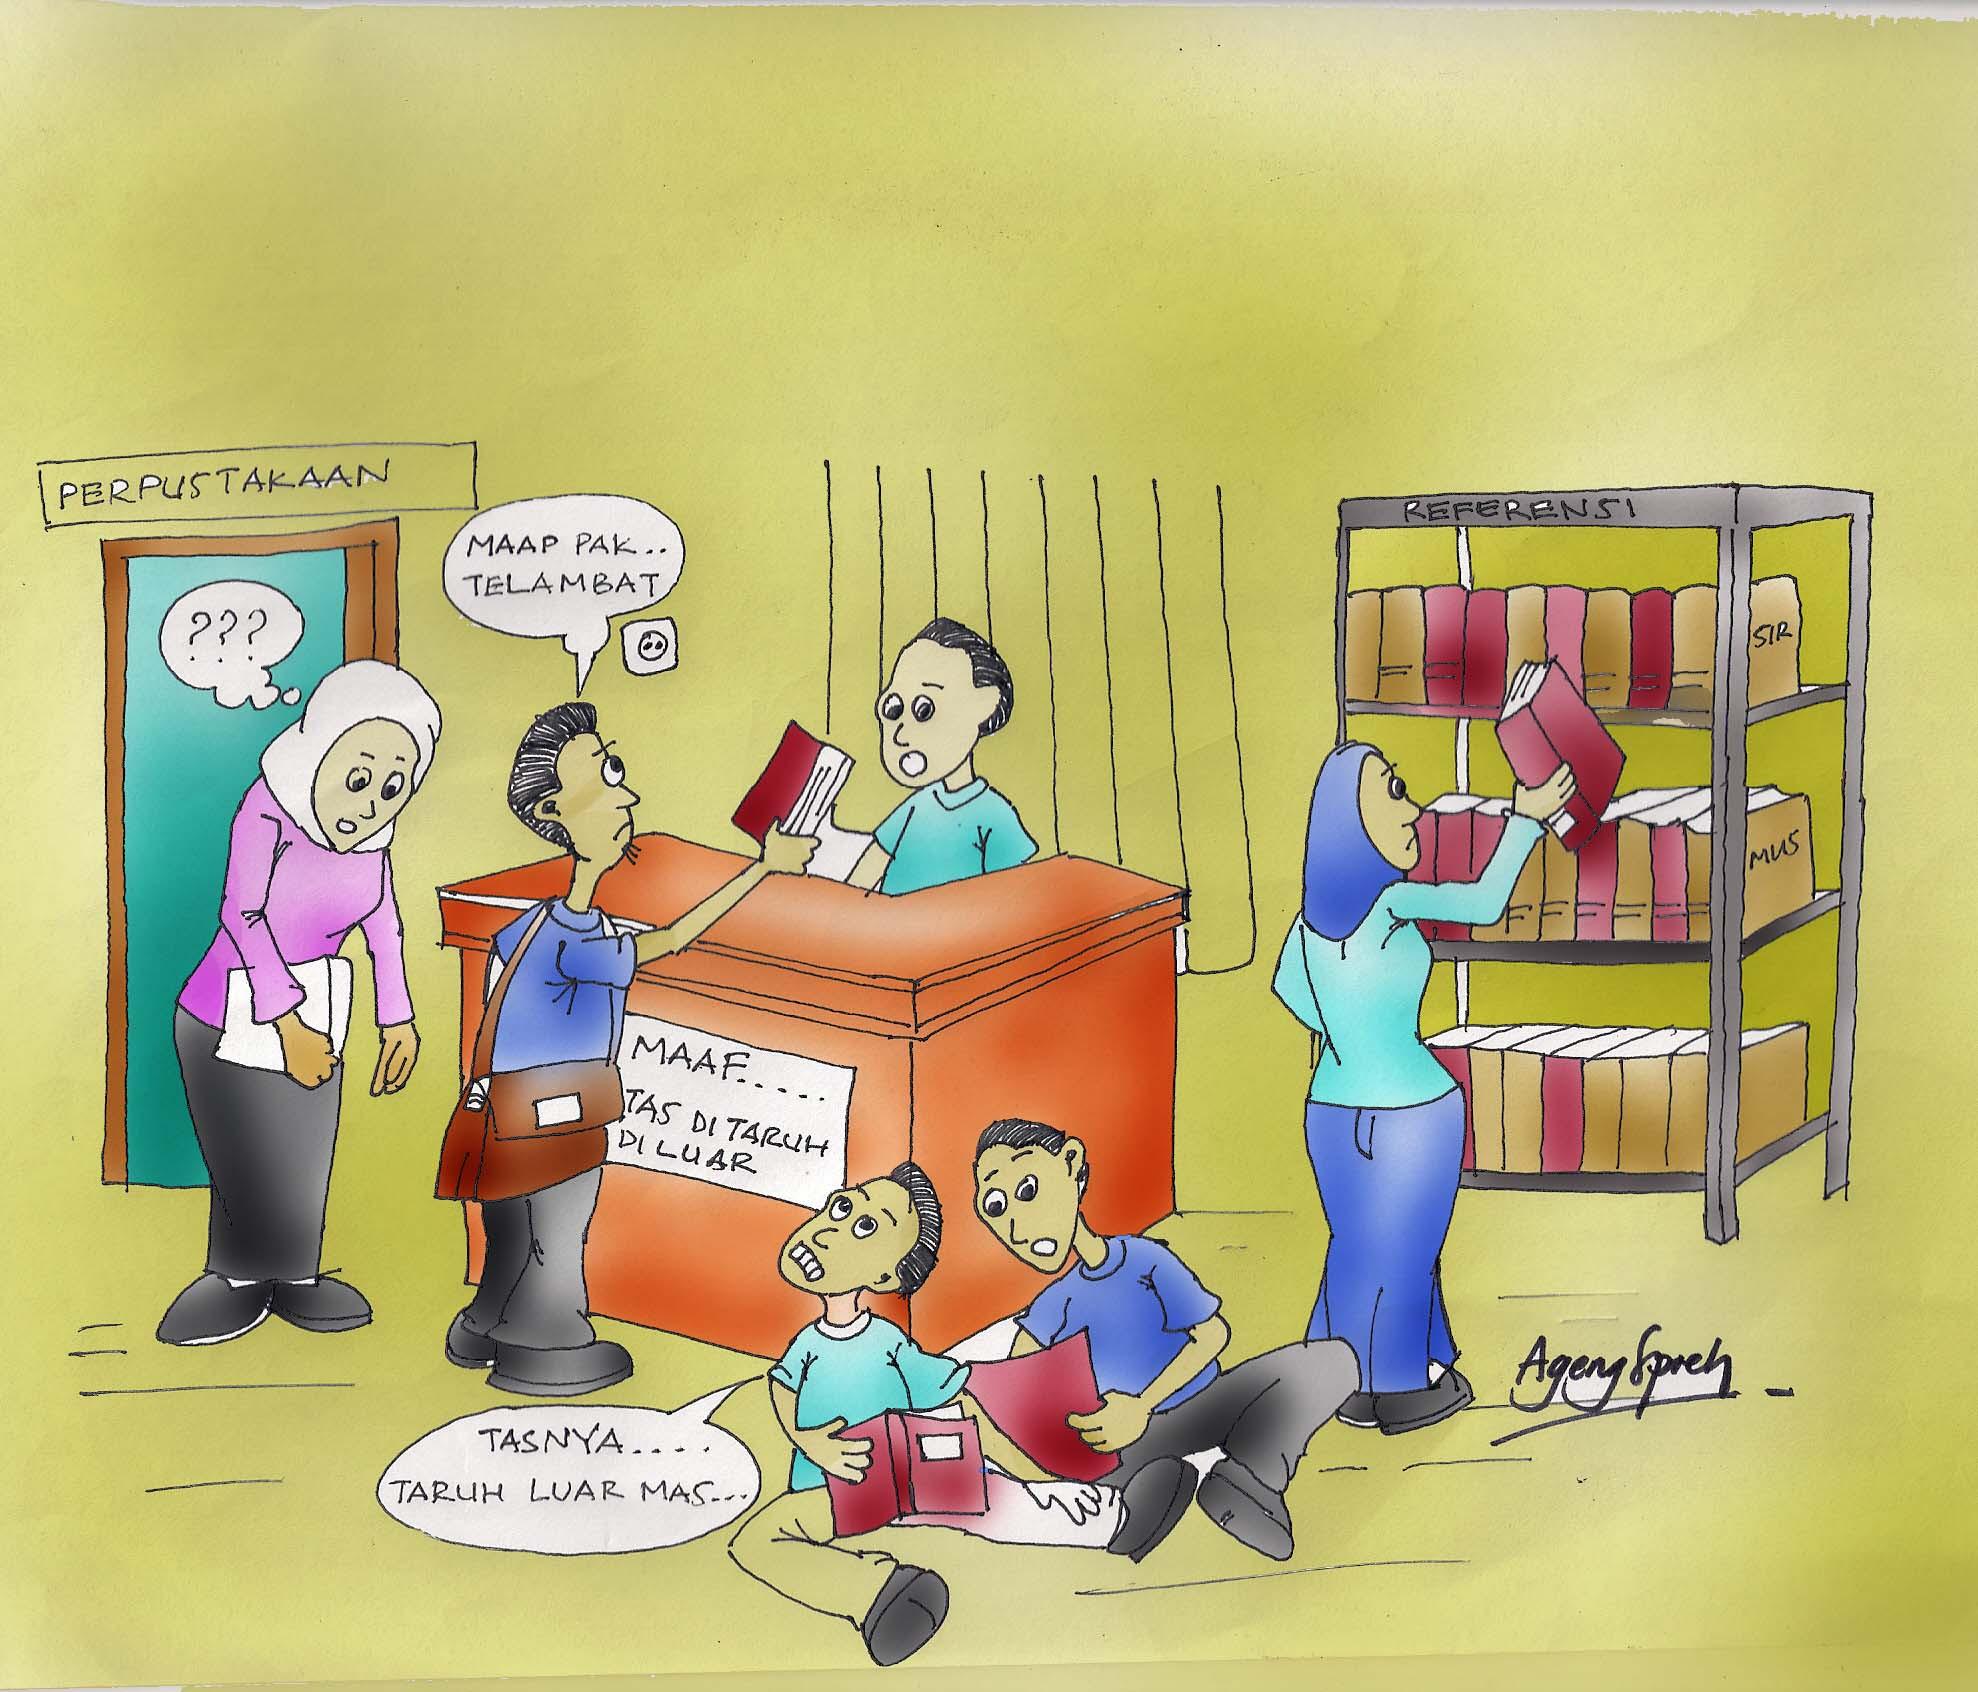 Perpustakaan Kartun Si Ageng Spreh